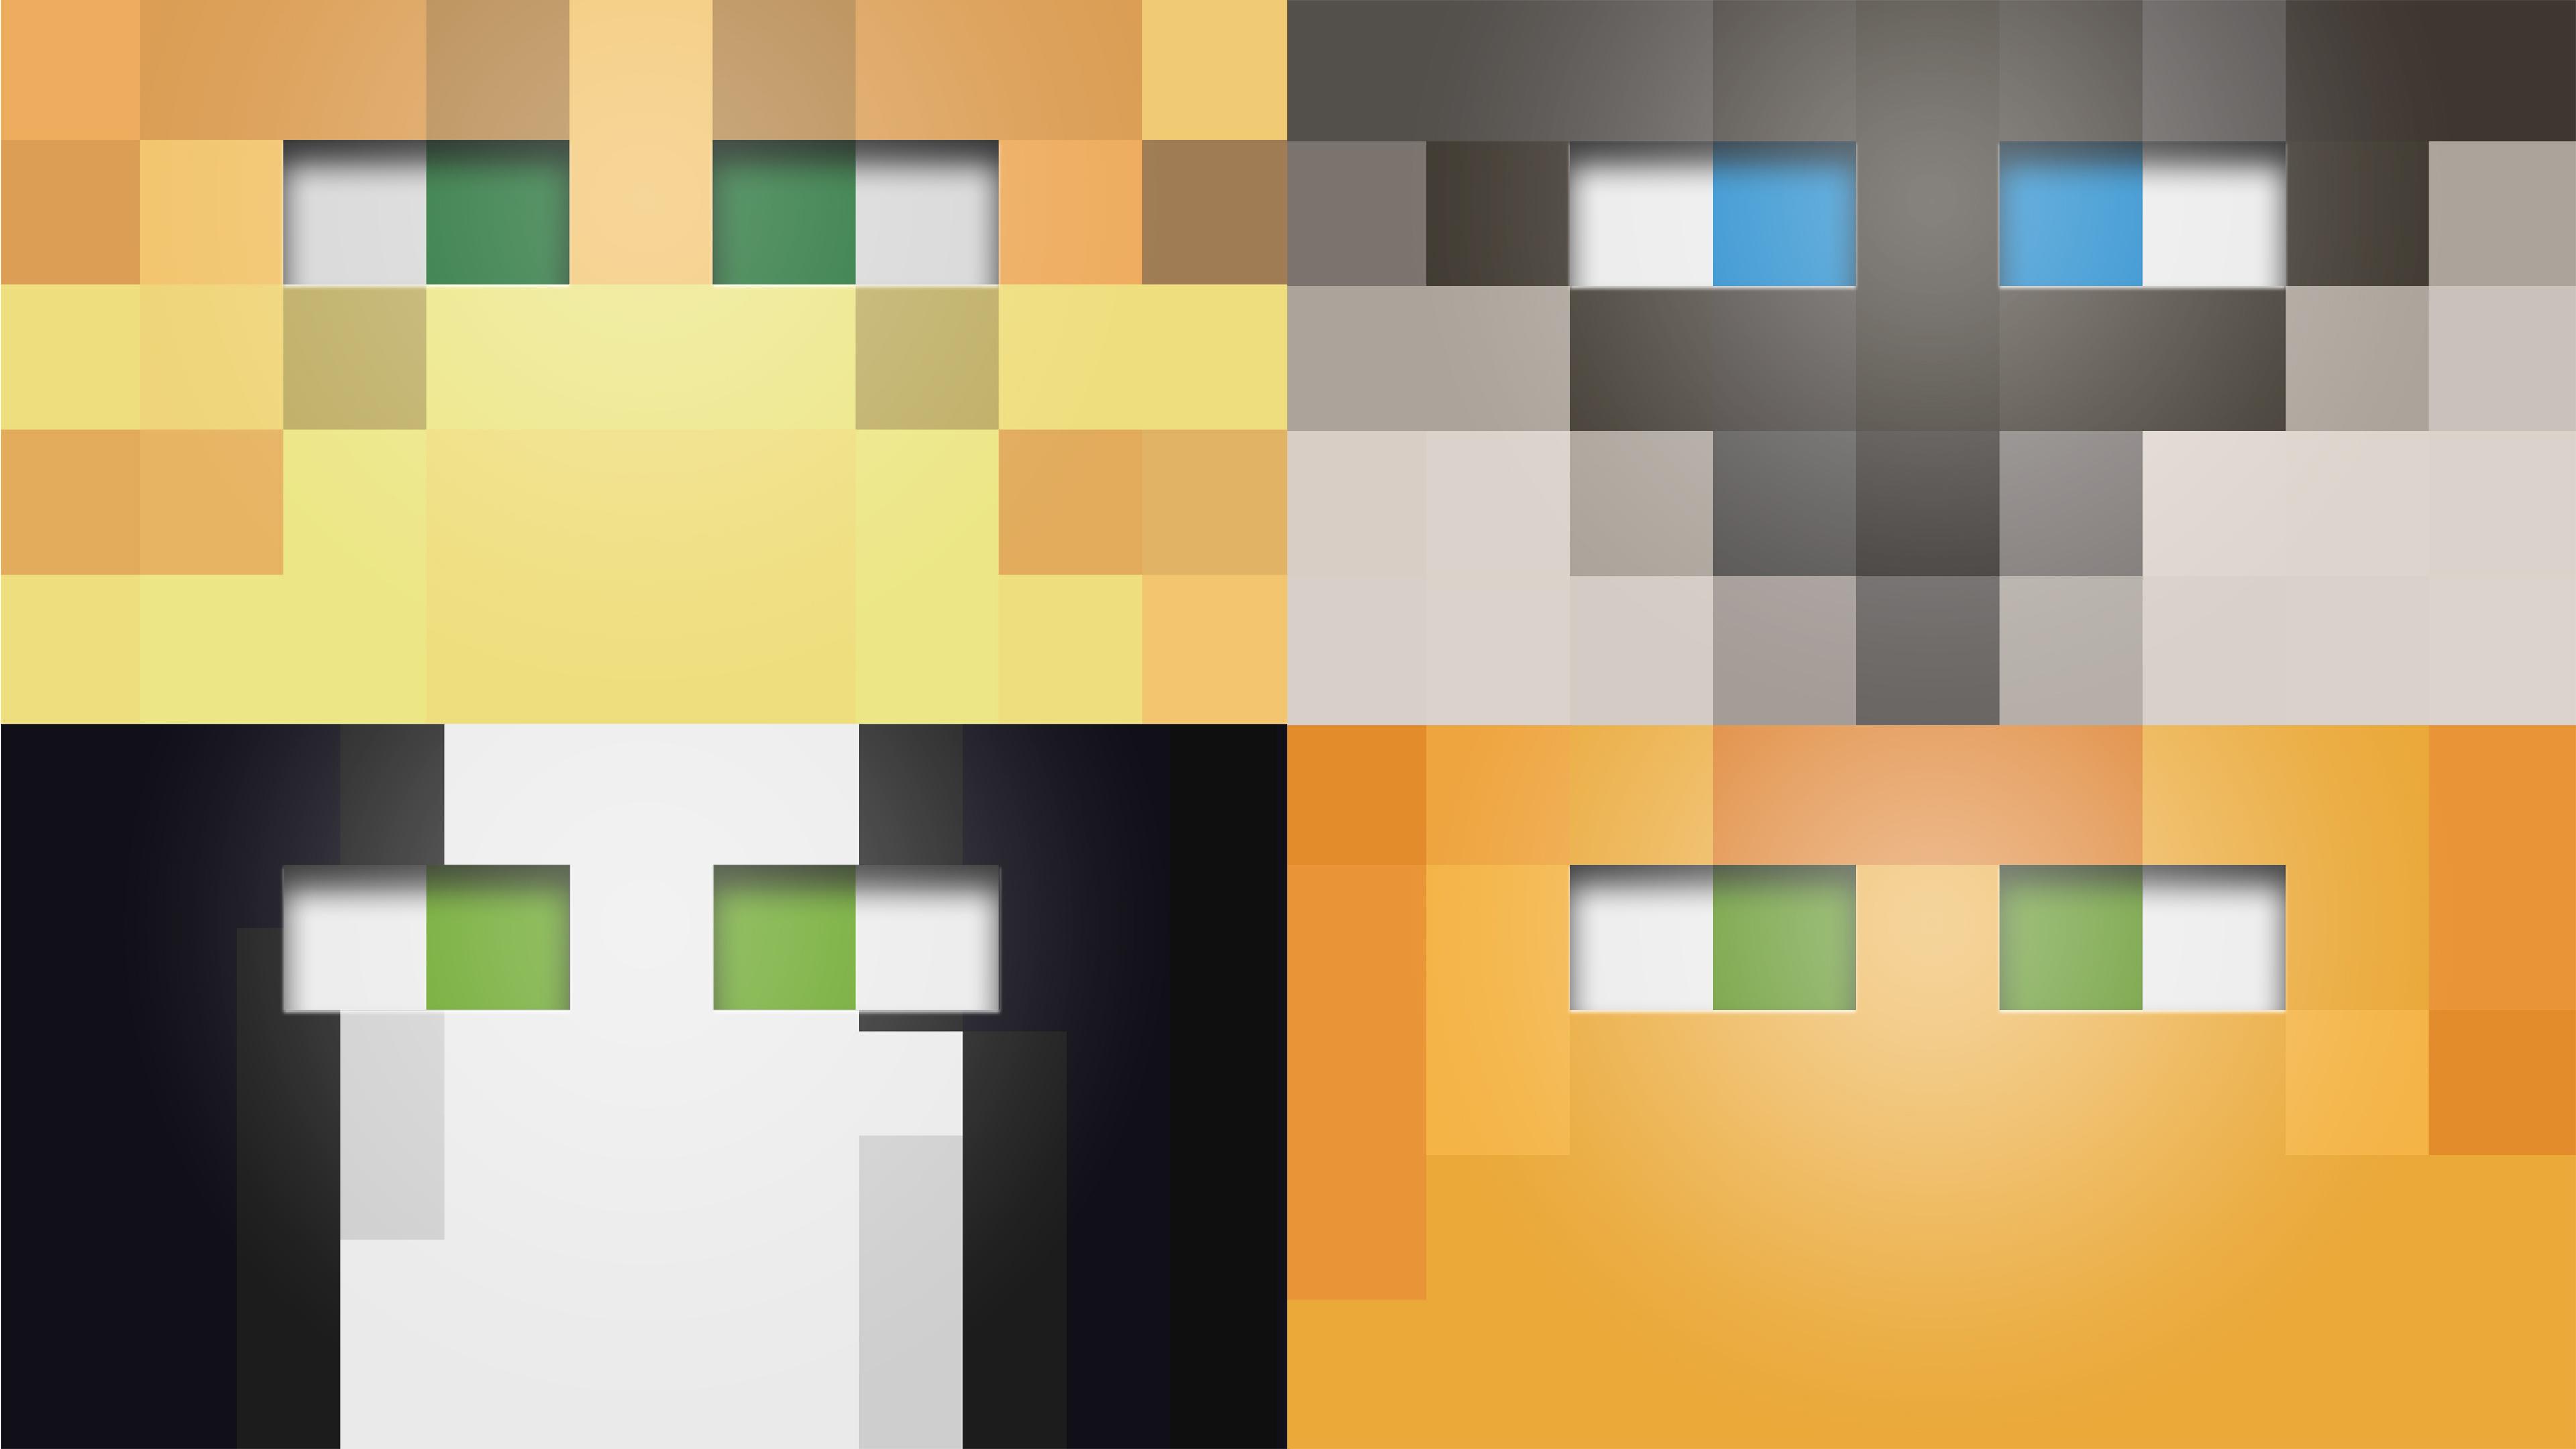 48 Minecraft Cat Wallpaper On Wallpapersafari